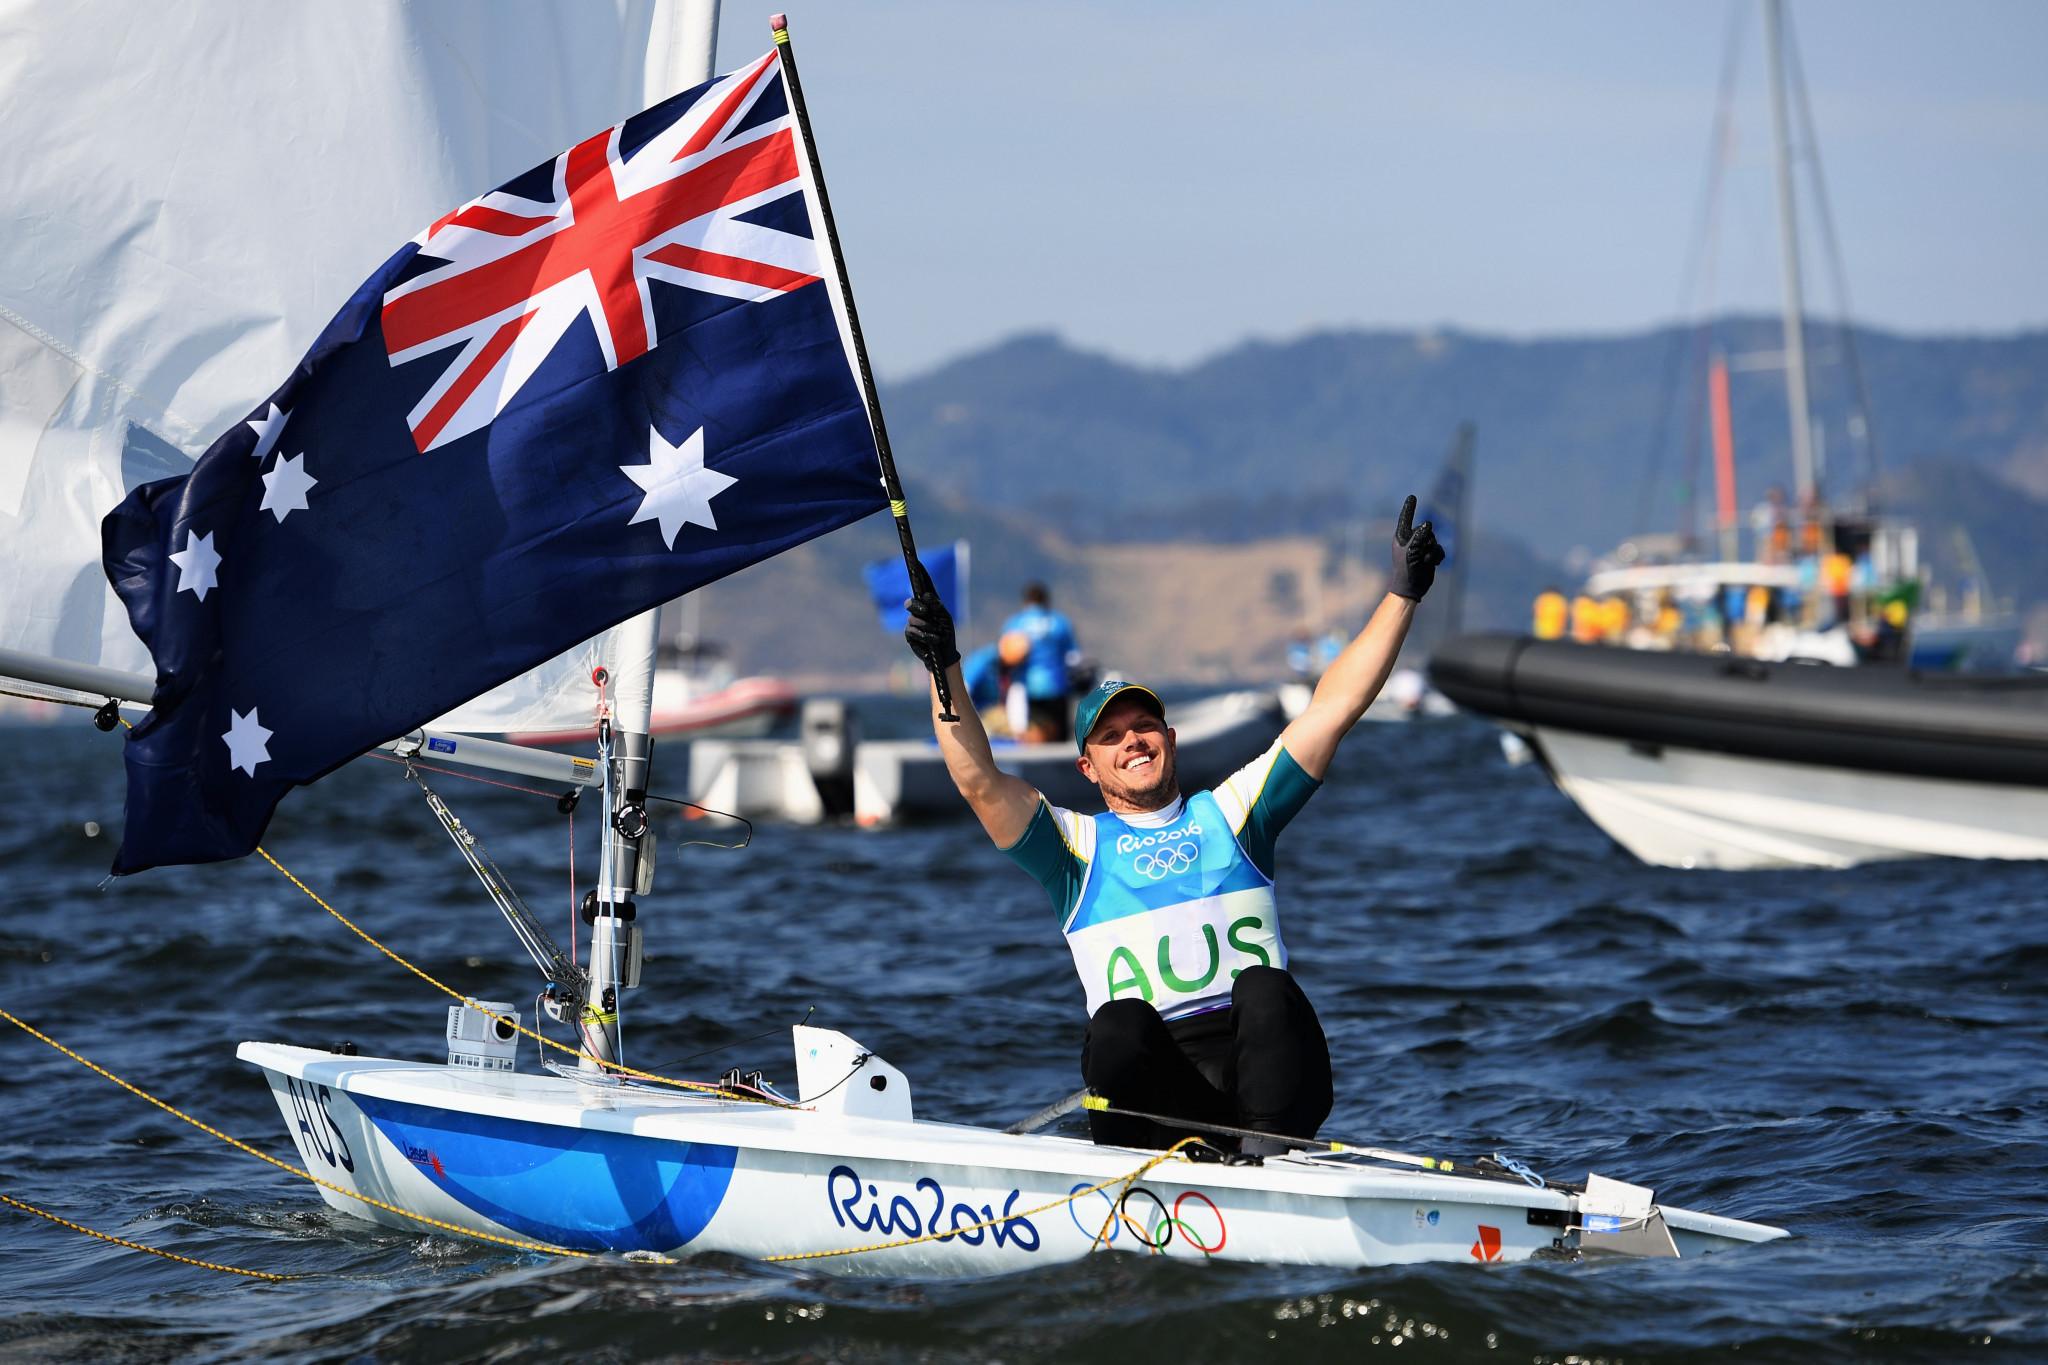 Olympic champion Burton claims lead at  Laser Men's World Championship